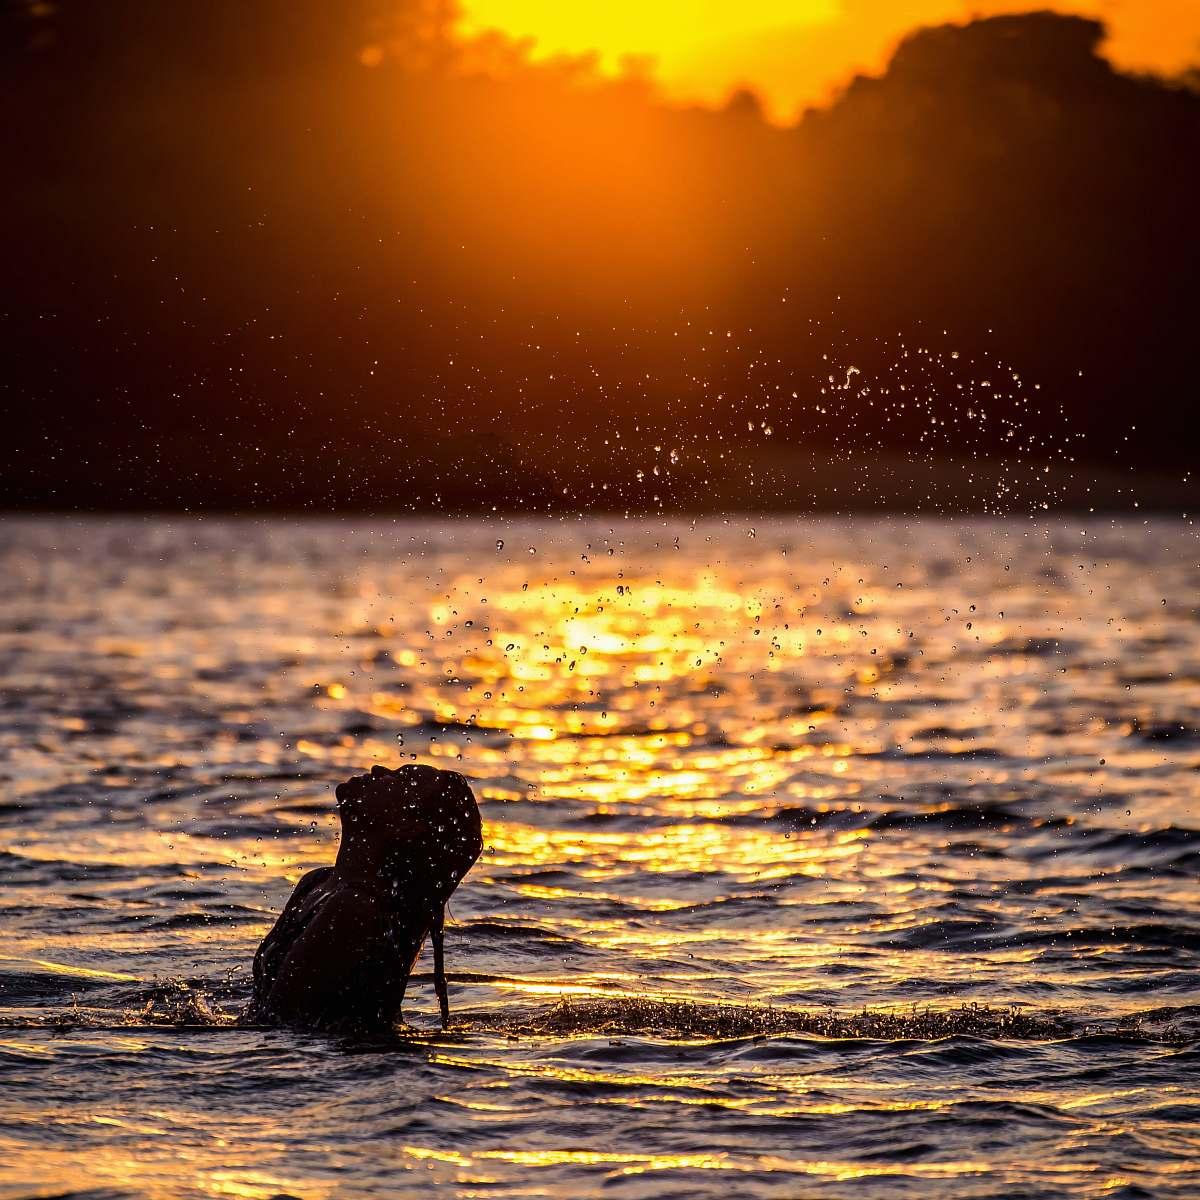 stock photos free  of splash woman in body of water near trees during sunset magic island resort